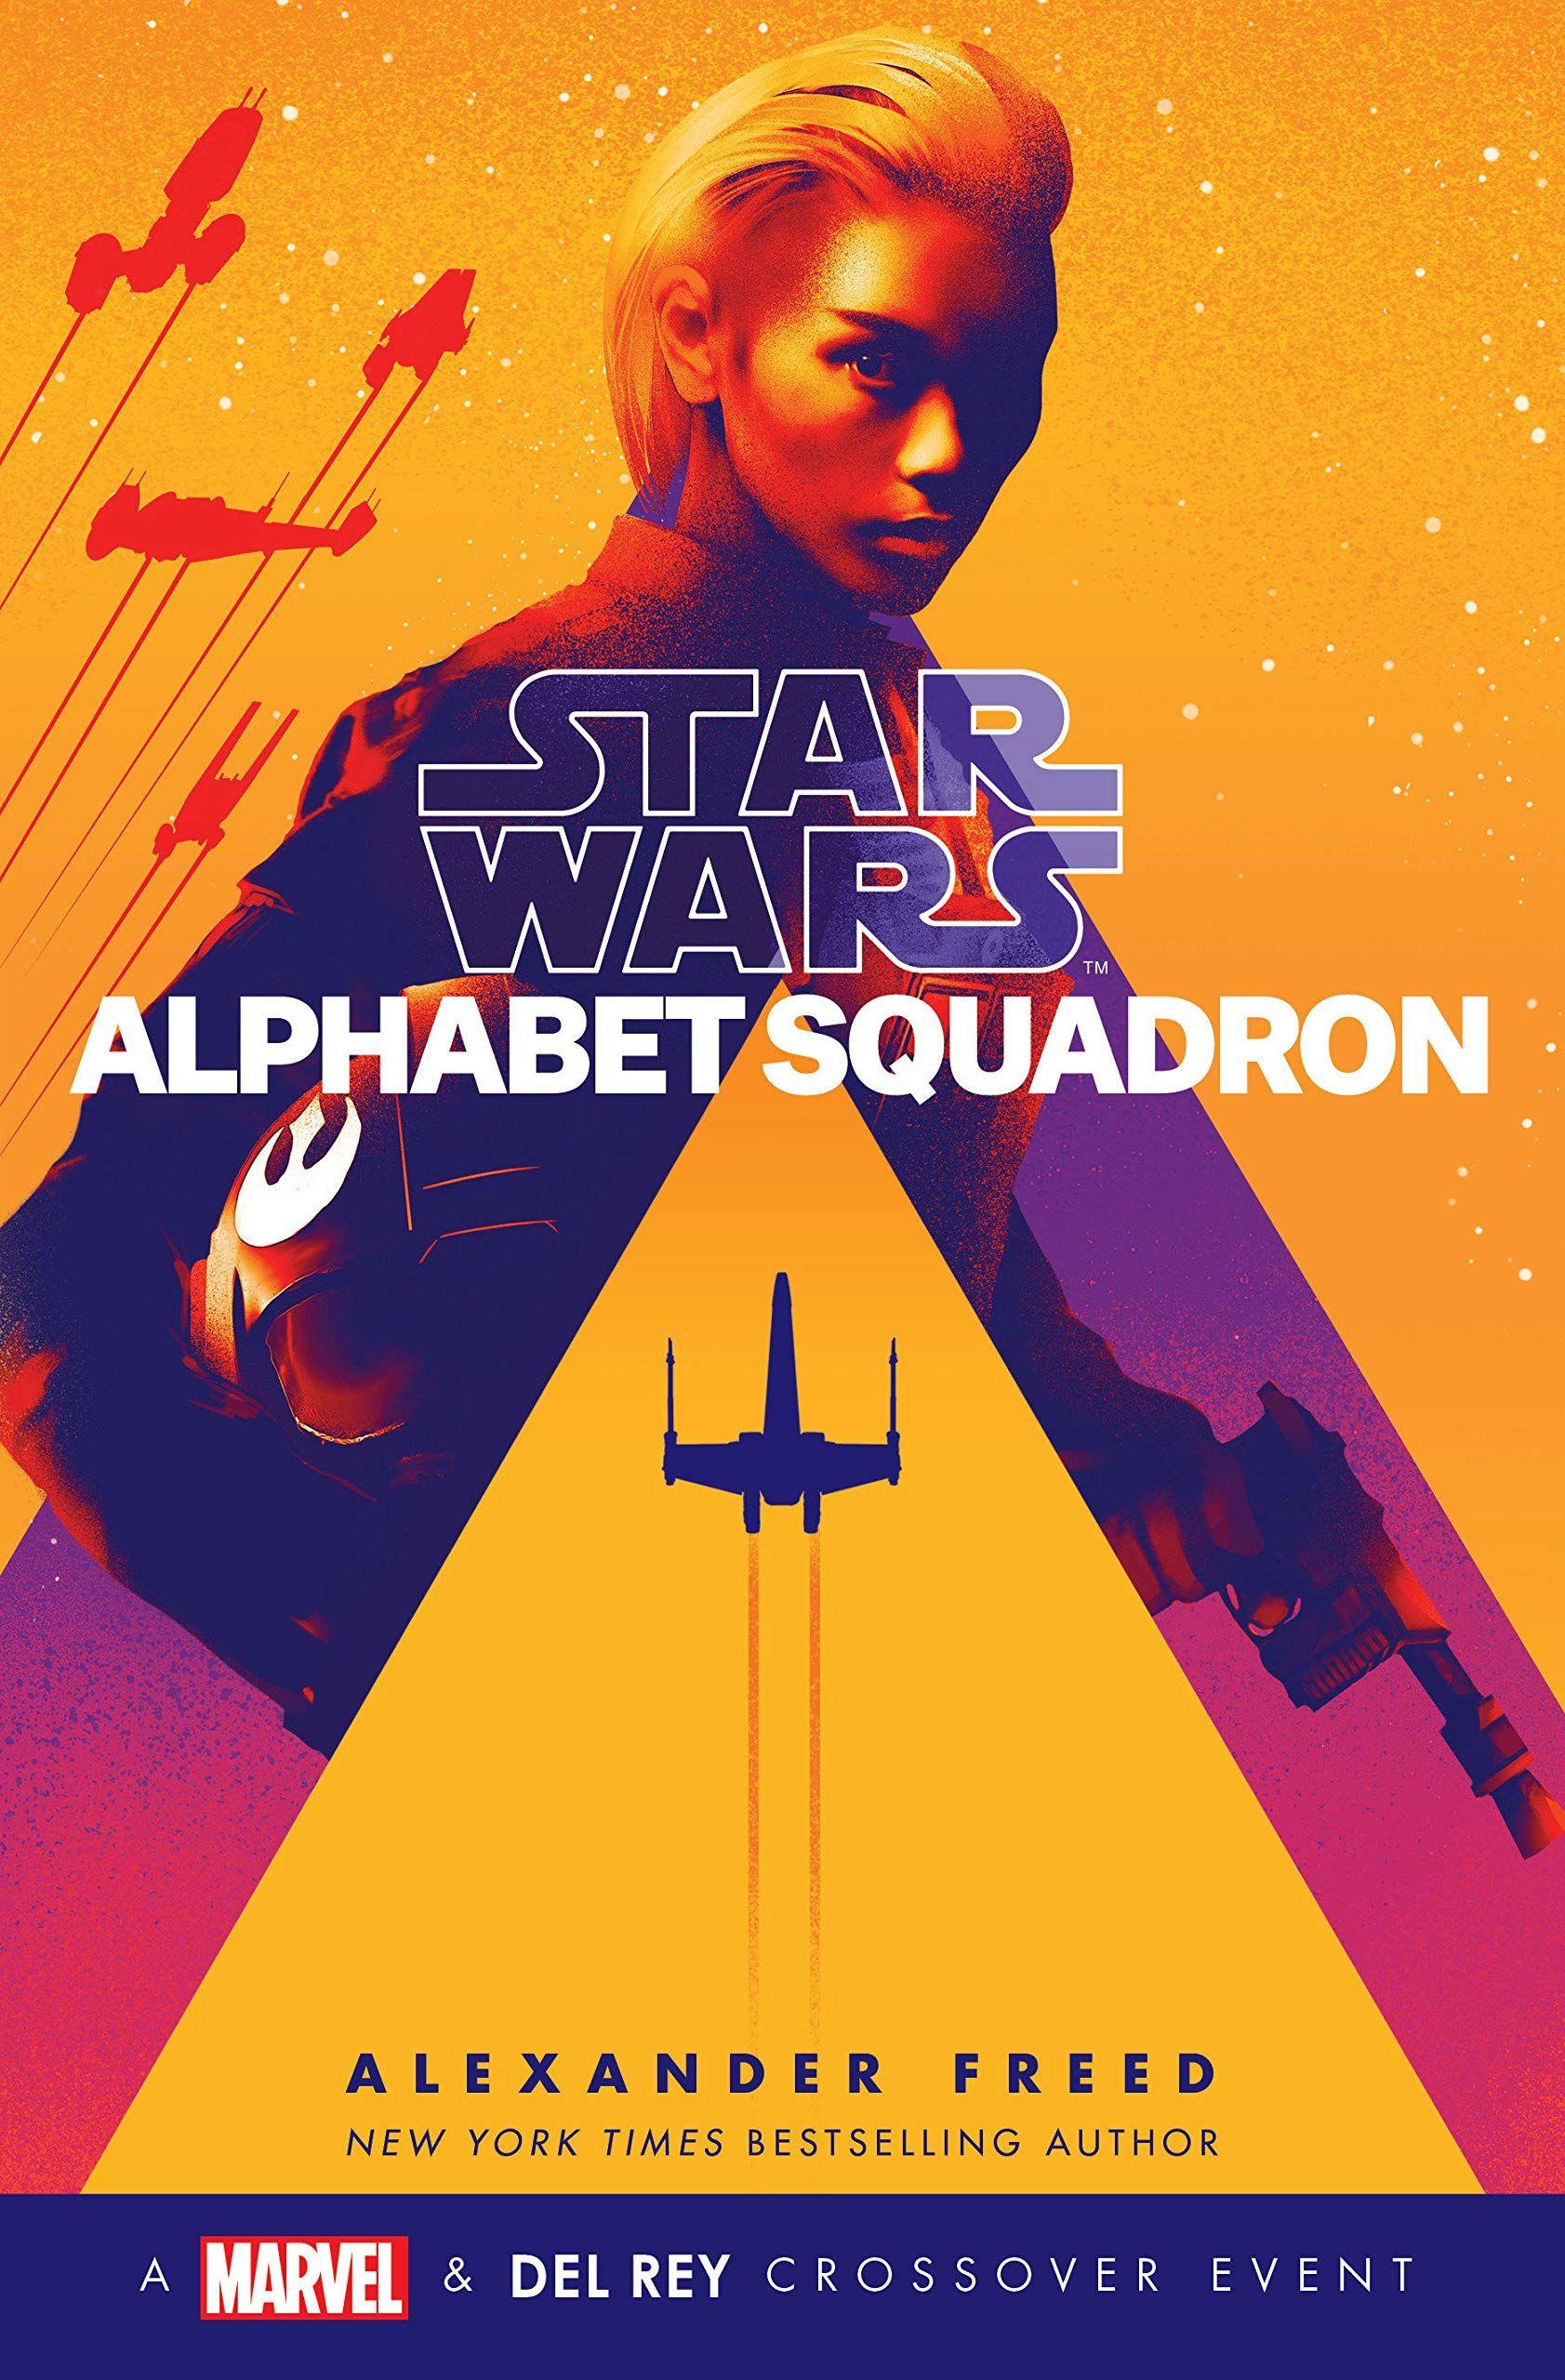 Alphabet Squadron Star Wars By Alexander Freed 9781984821980 Penguinrandomhouse Com Books Star Wars Star Wars Online Star Wars Books